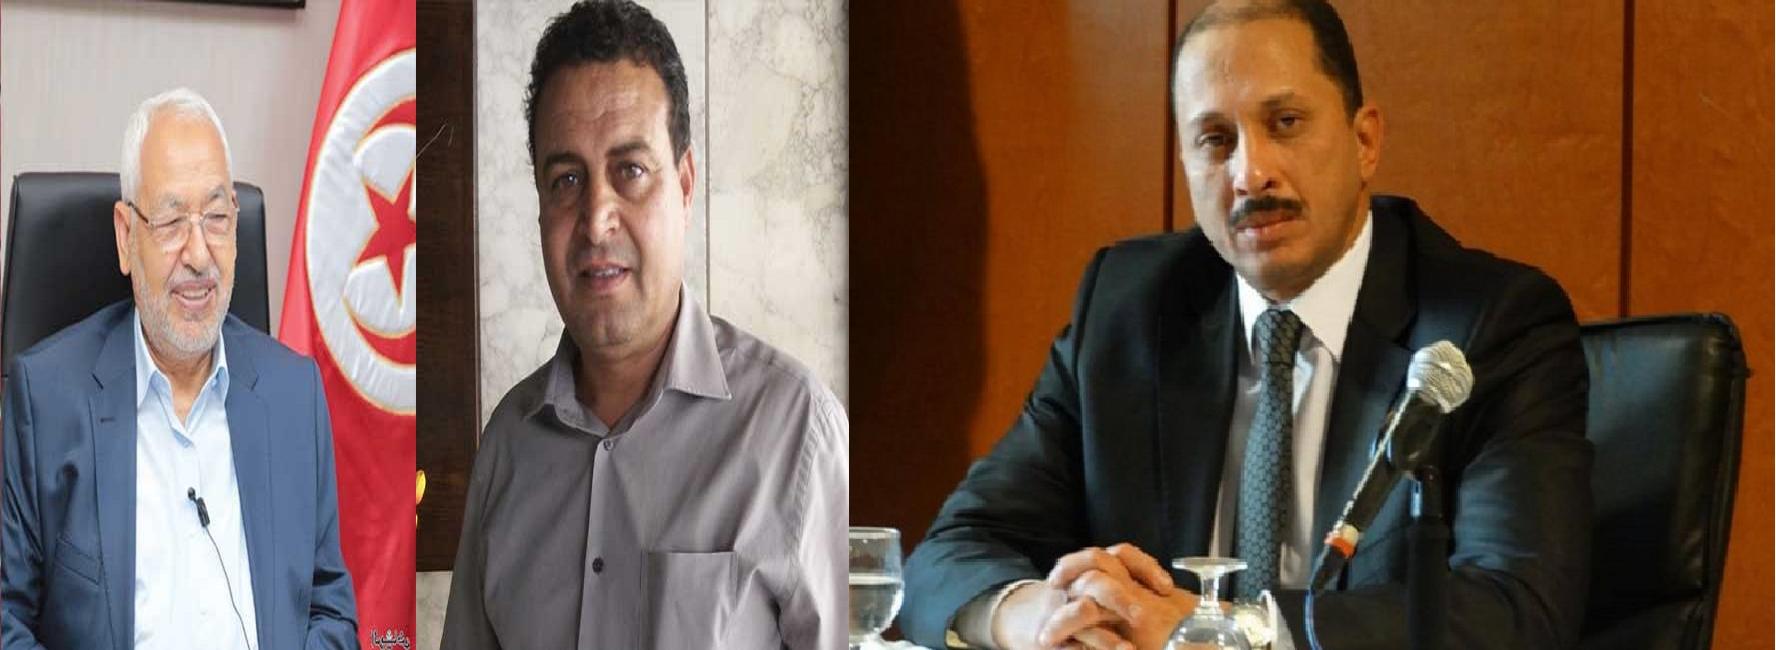 Tunisie : Mohamed Abbou, Zouhaier Maghzaoui et Reched Ghanouchi se réunissent ce mardi